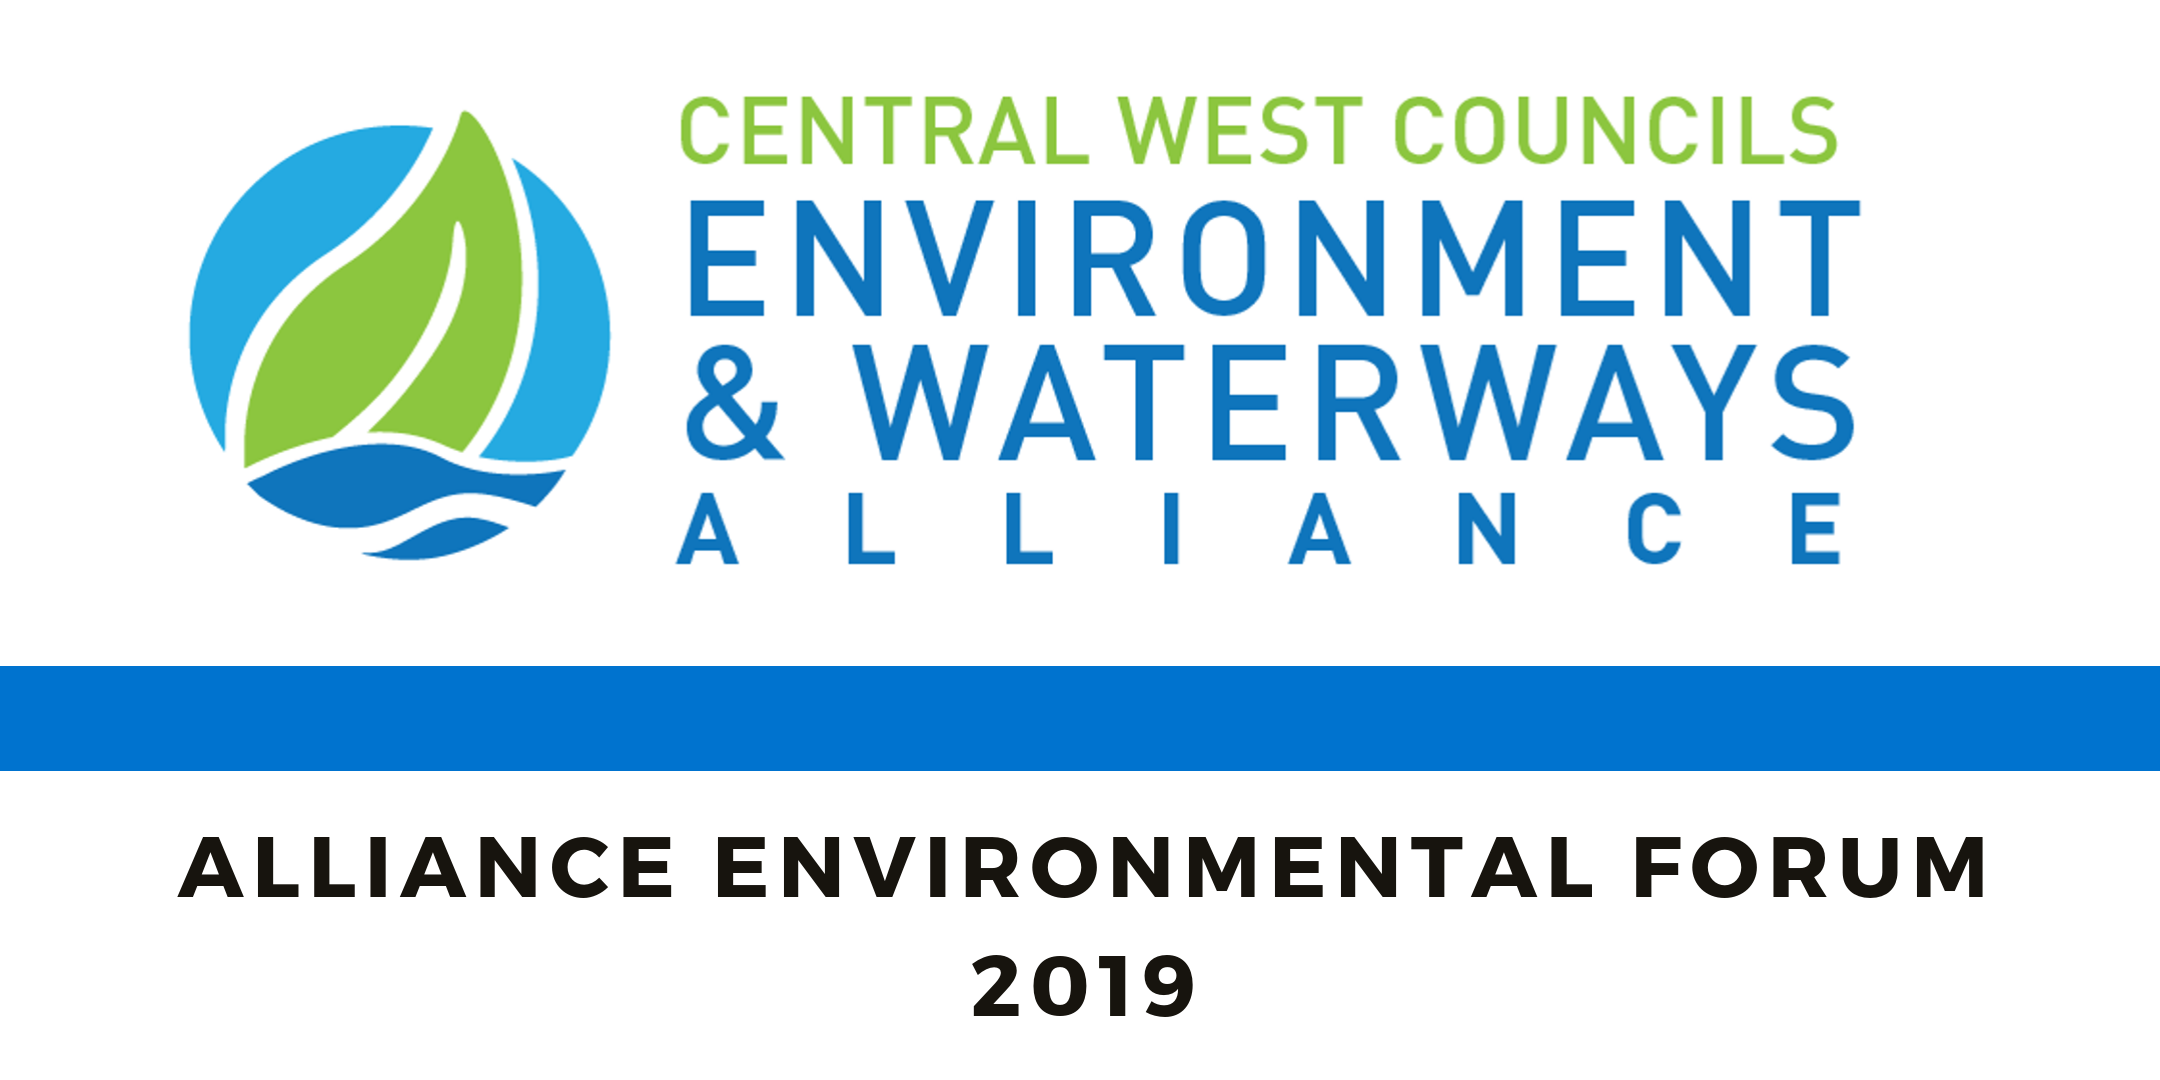 Alliance Environmental Forum 2019.png